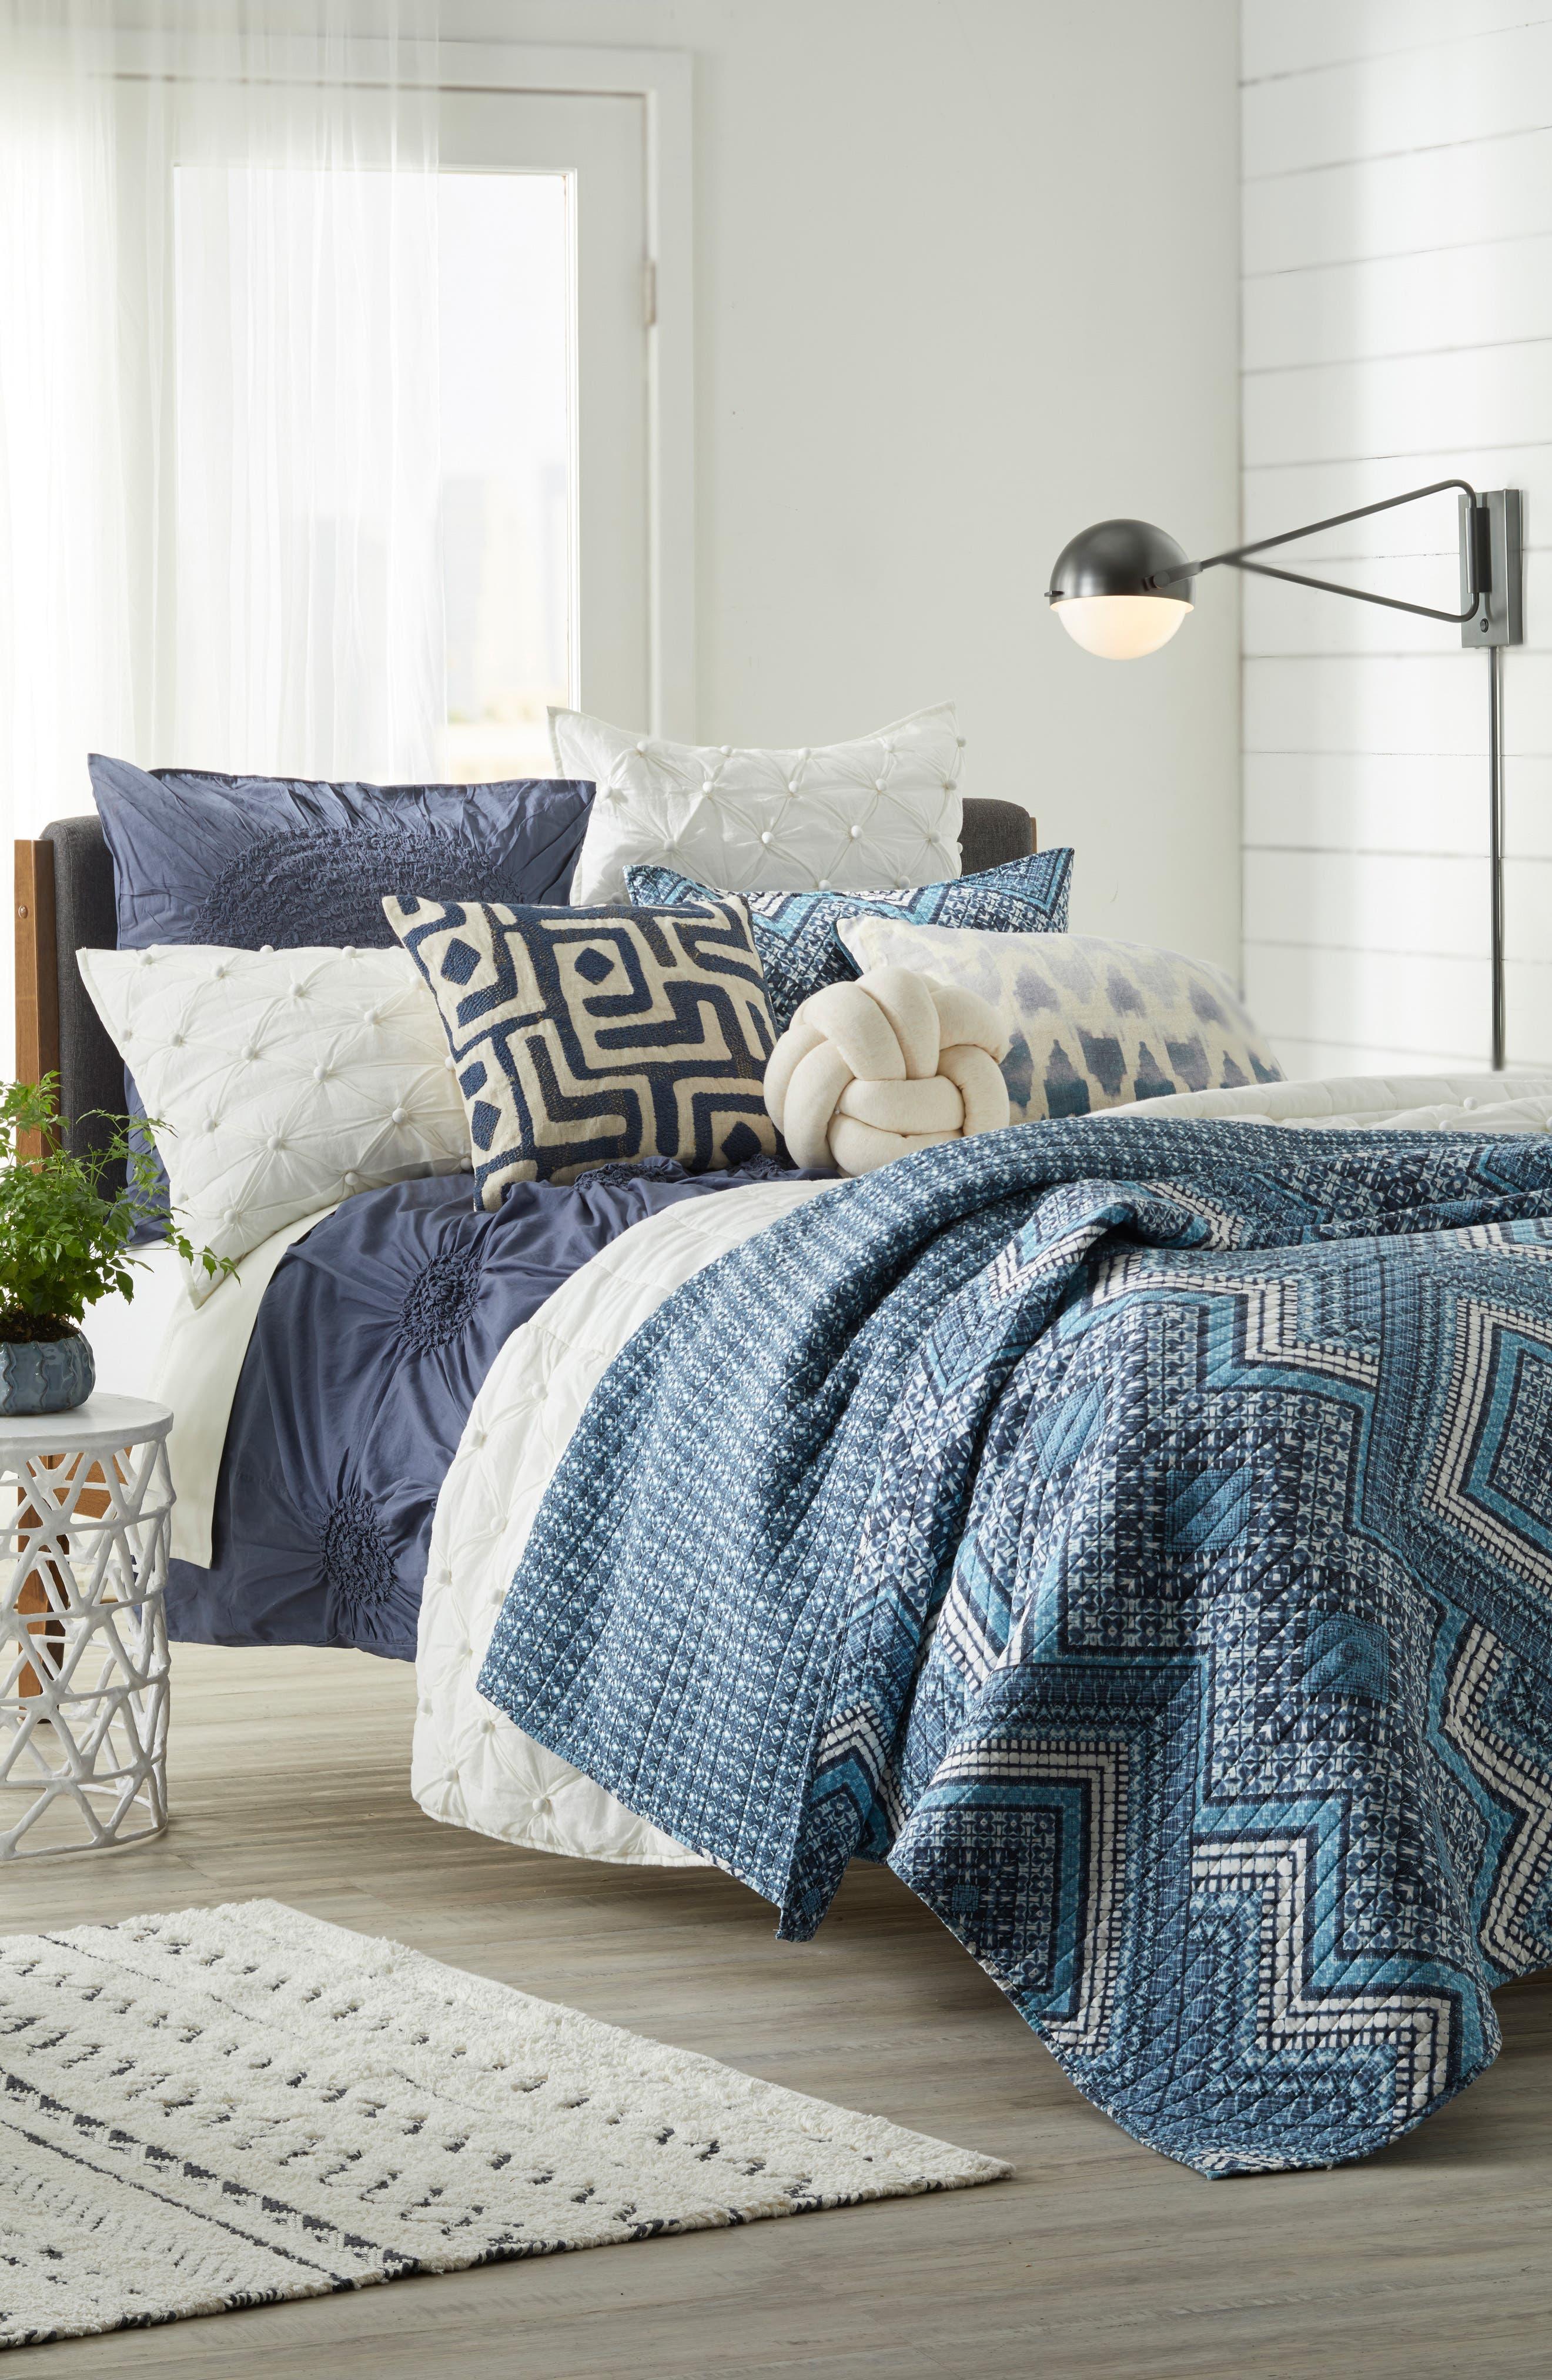 Nordstrom at Home Chloe Duvet & Levtex Takara Quilt Bedding Collection